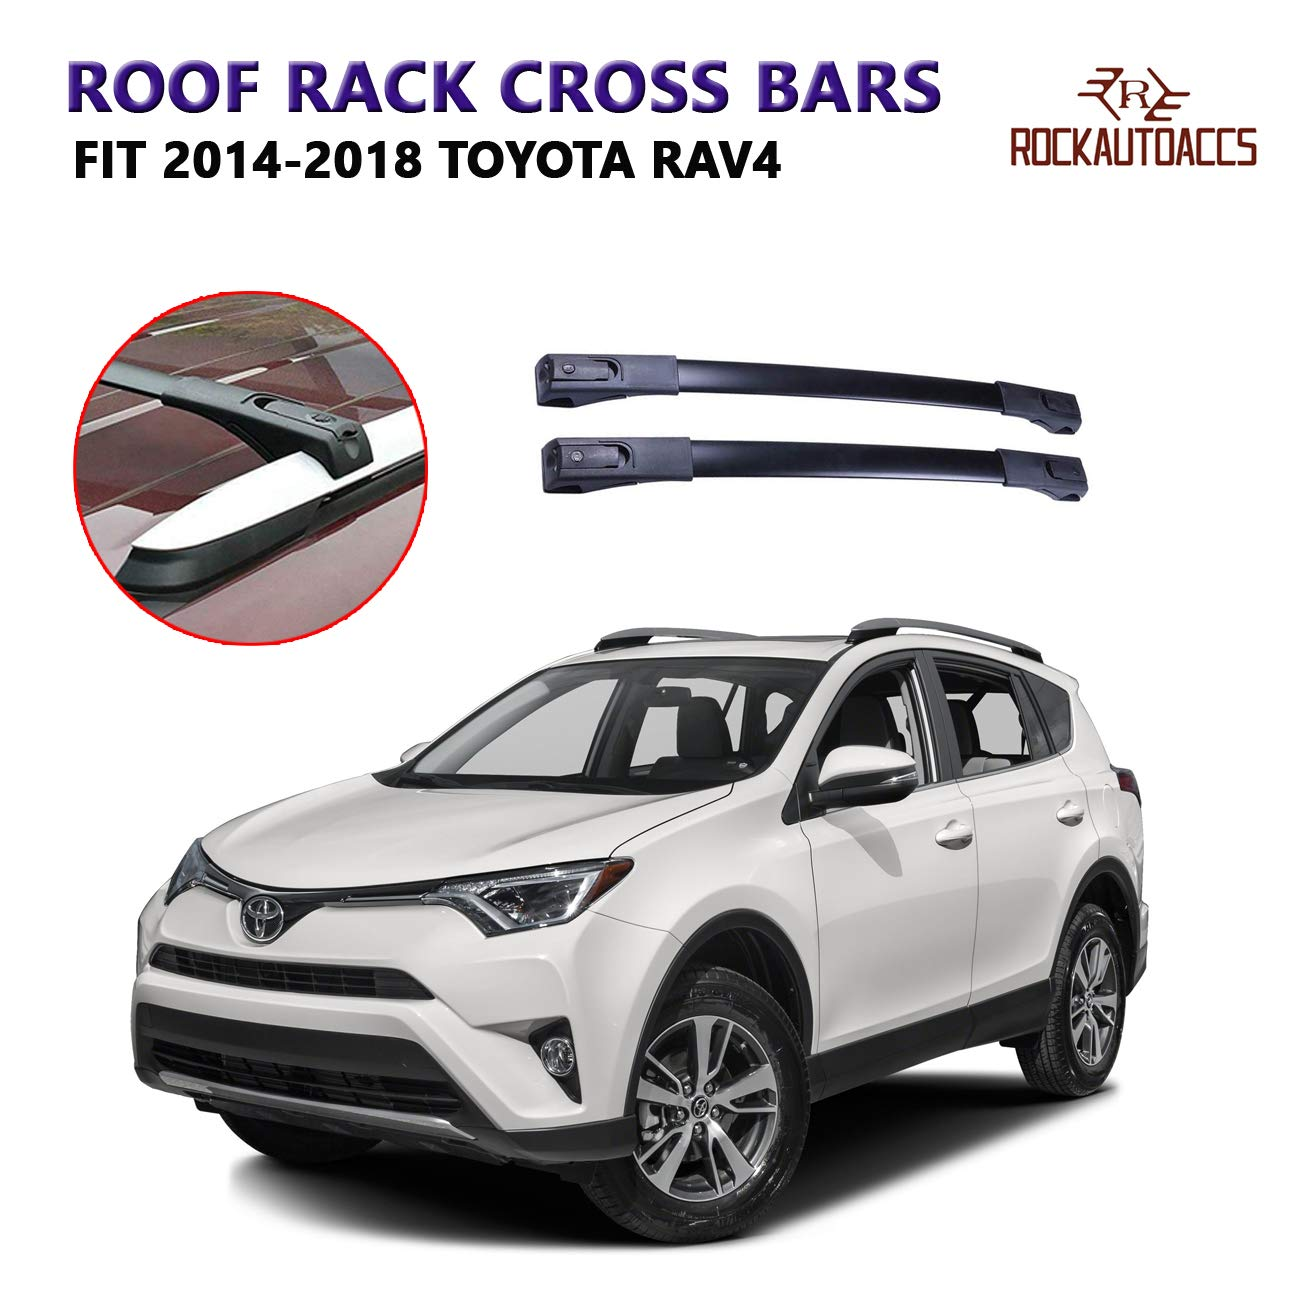 Yeeoy Roof Rack Cross Bars Replacement for RAV4 2014 2015 2016 2017 2018